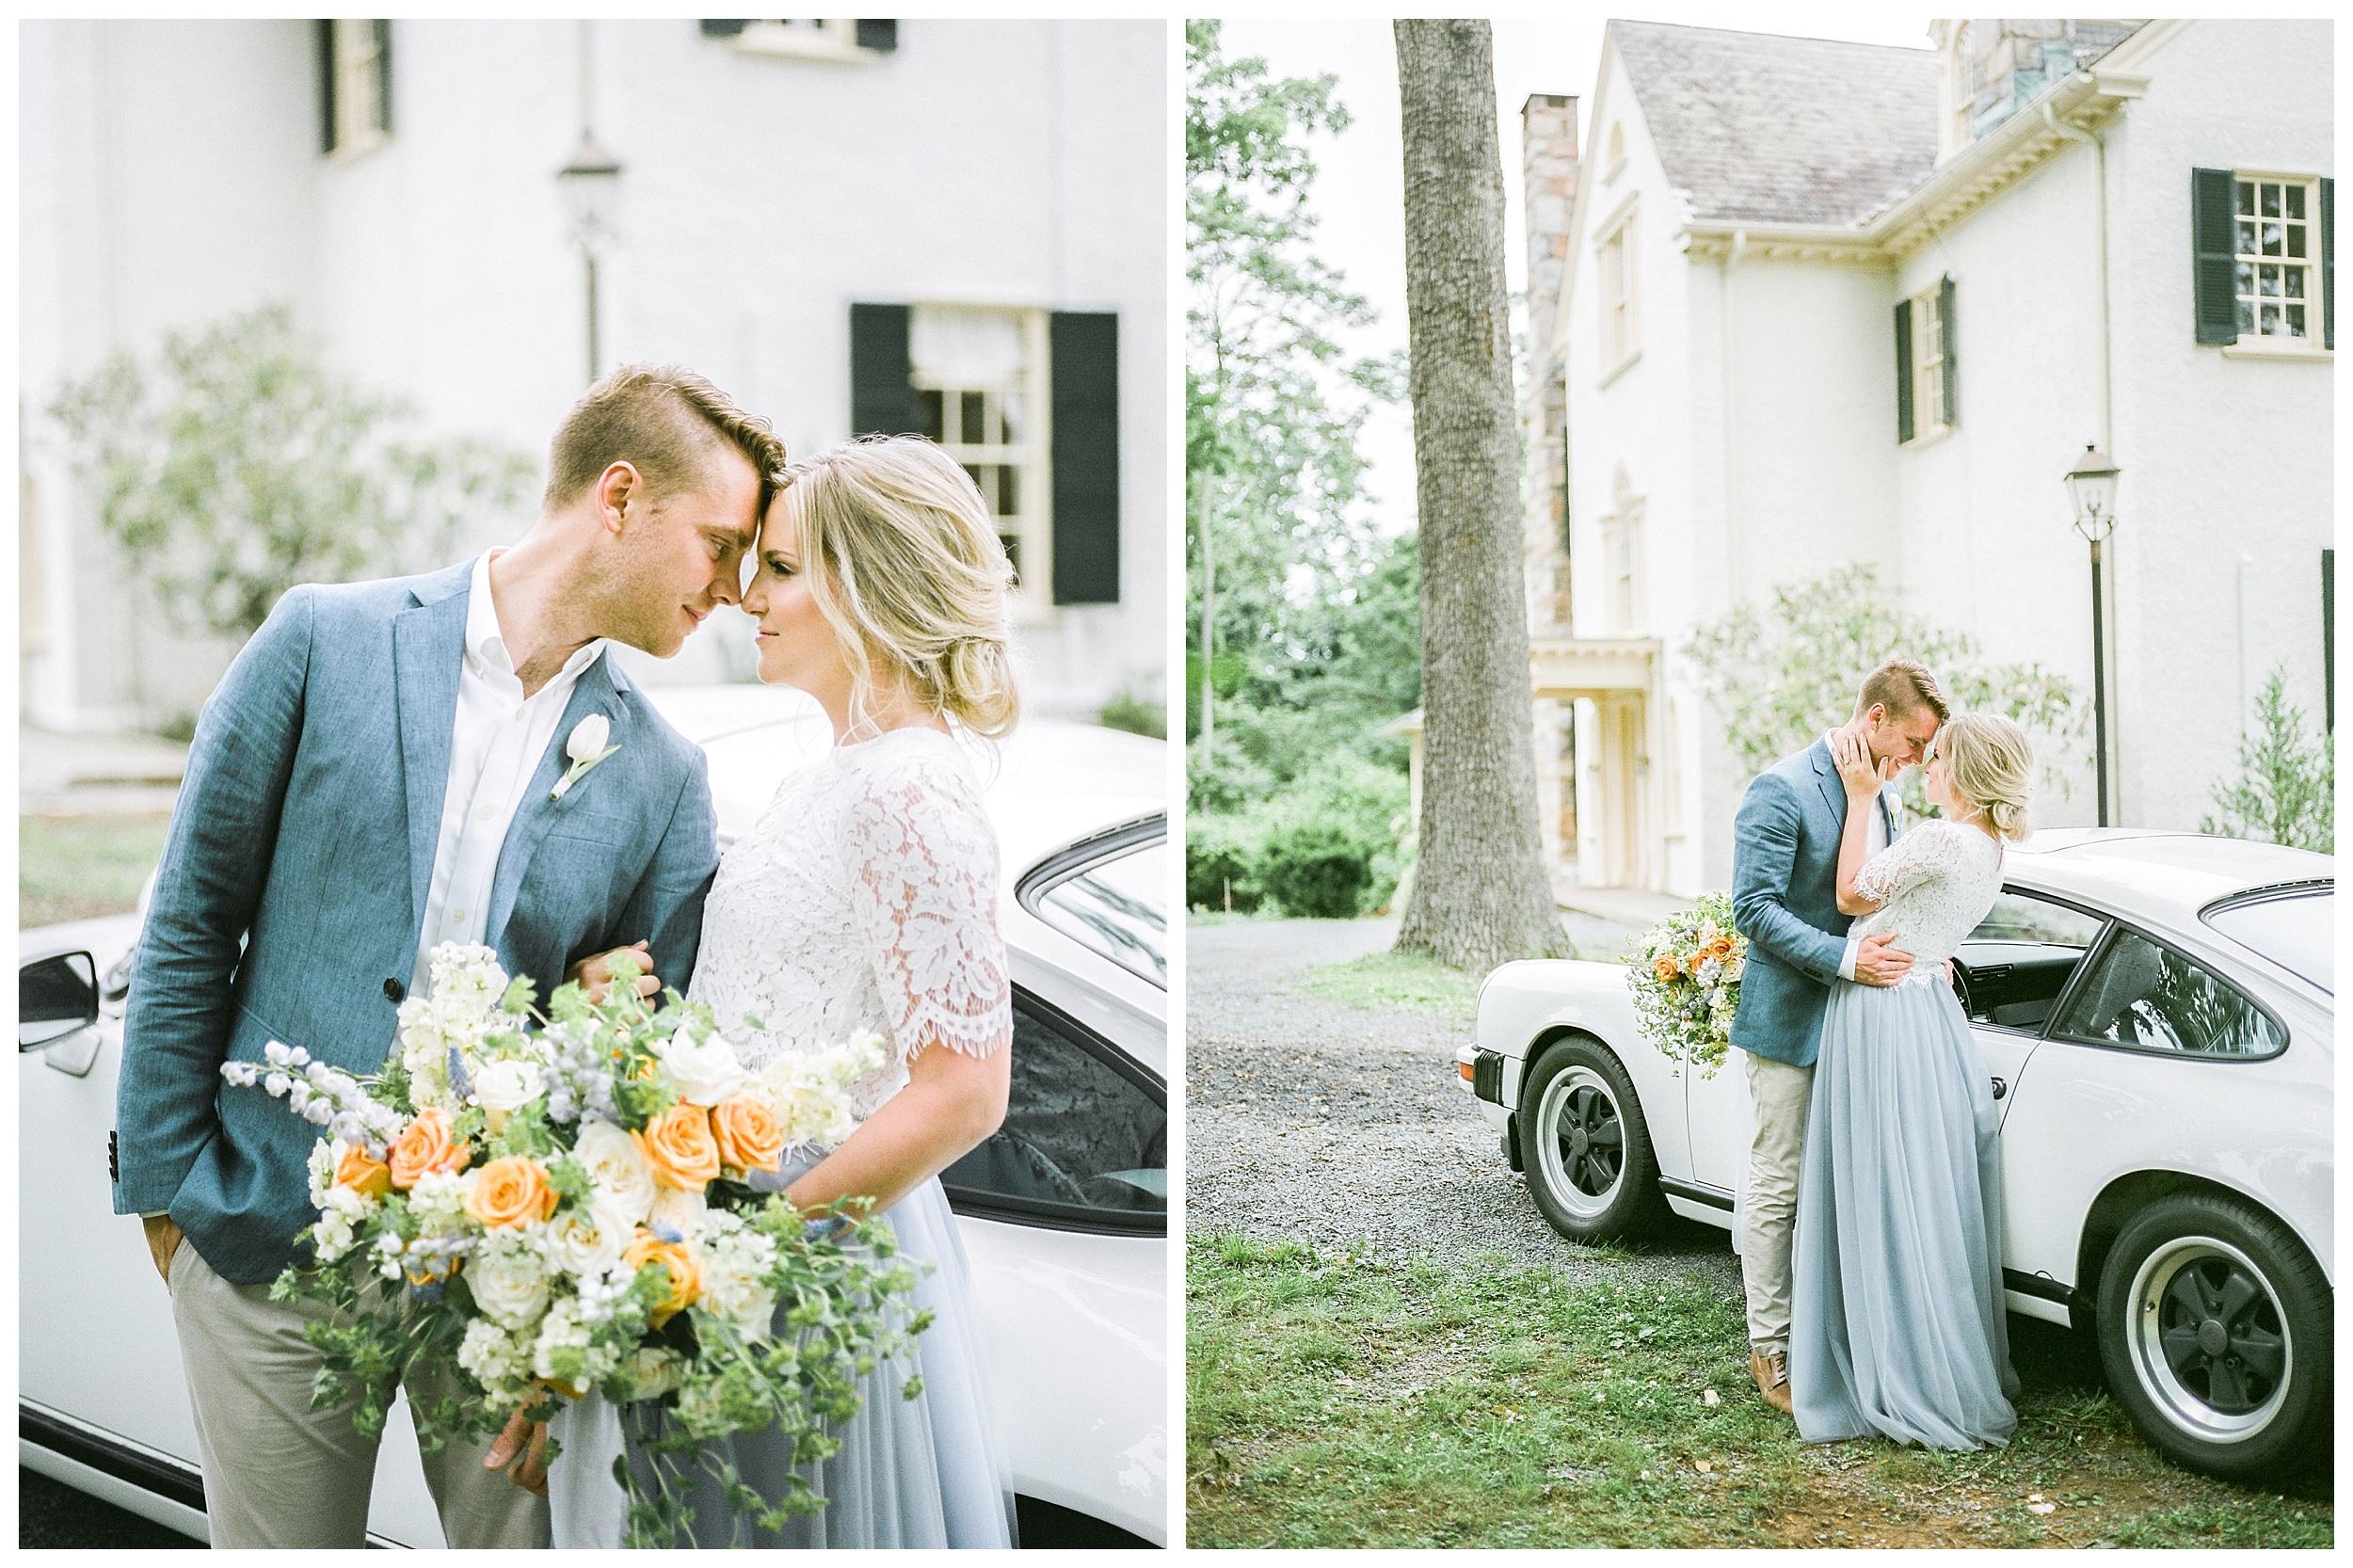 Rust Manor Wedding   Virginia Wedding Photographer Kir Tuben_0029.jpg